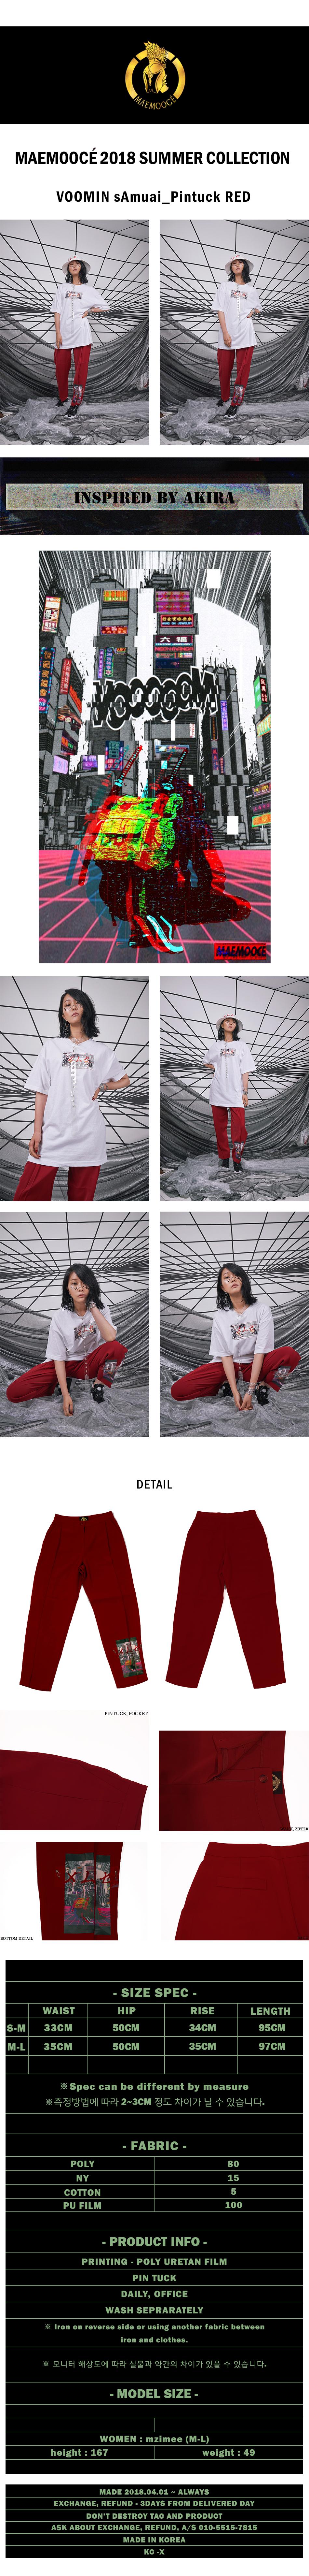 VOOMIN sAmuai_Pintuck RED copy.JPG